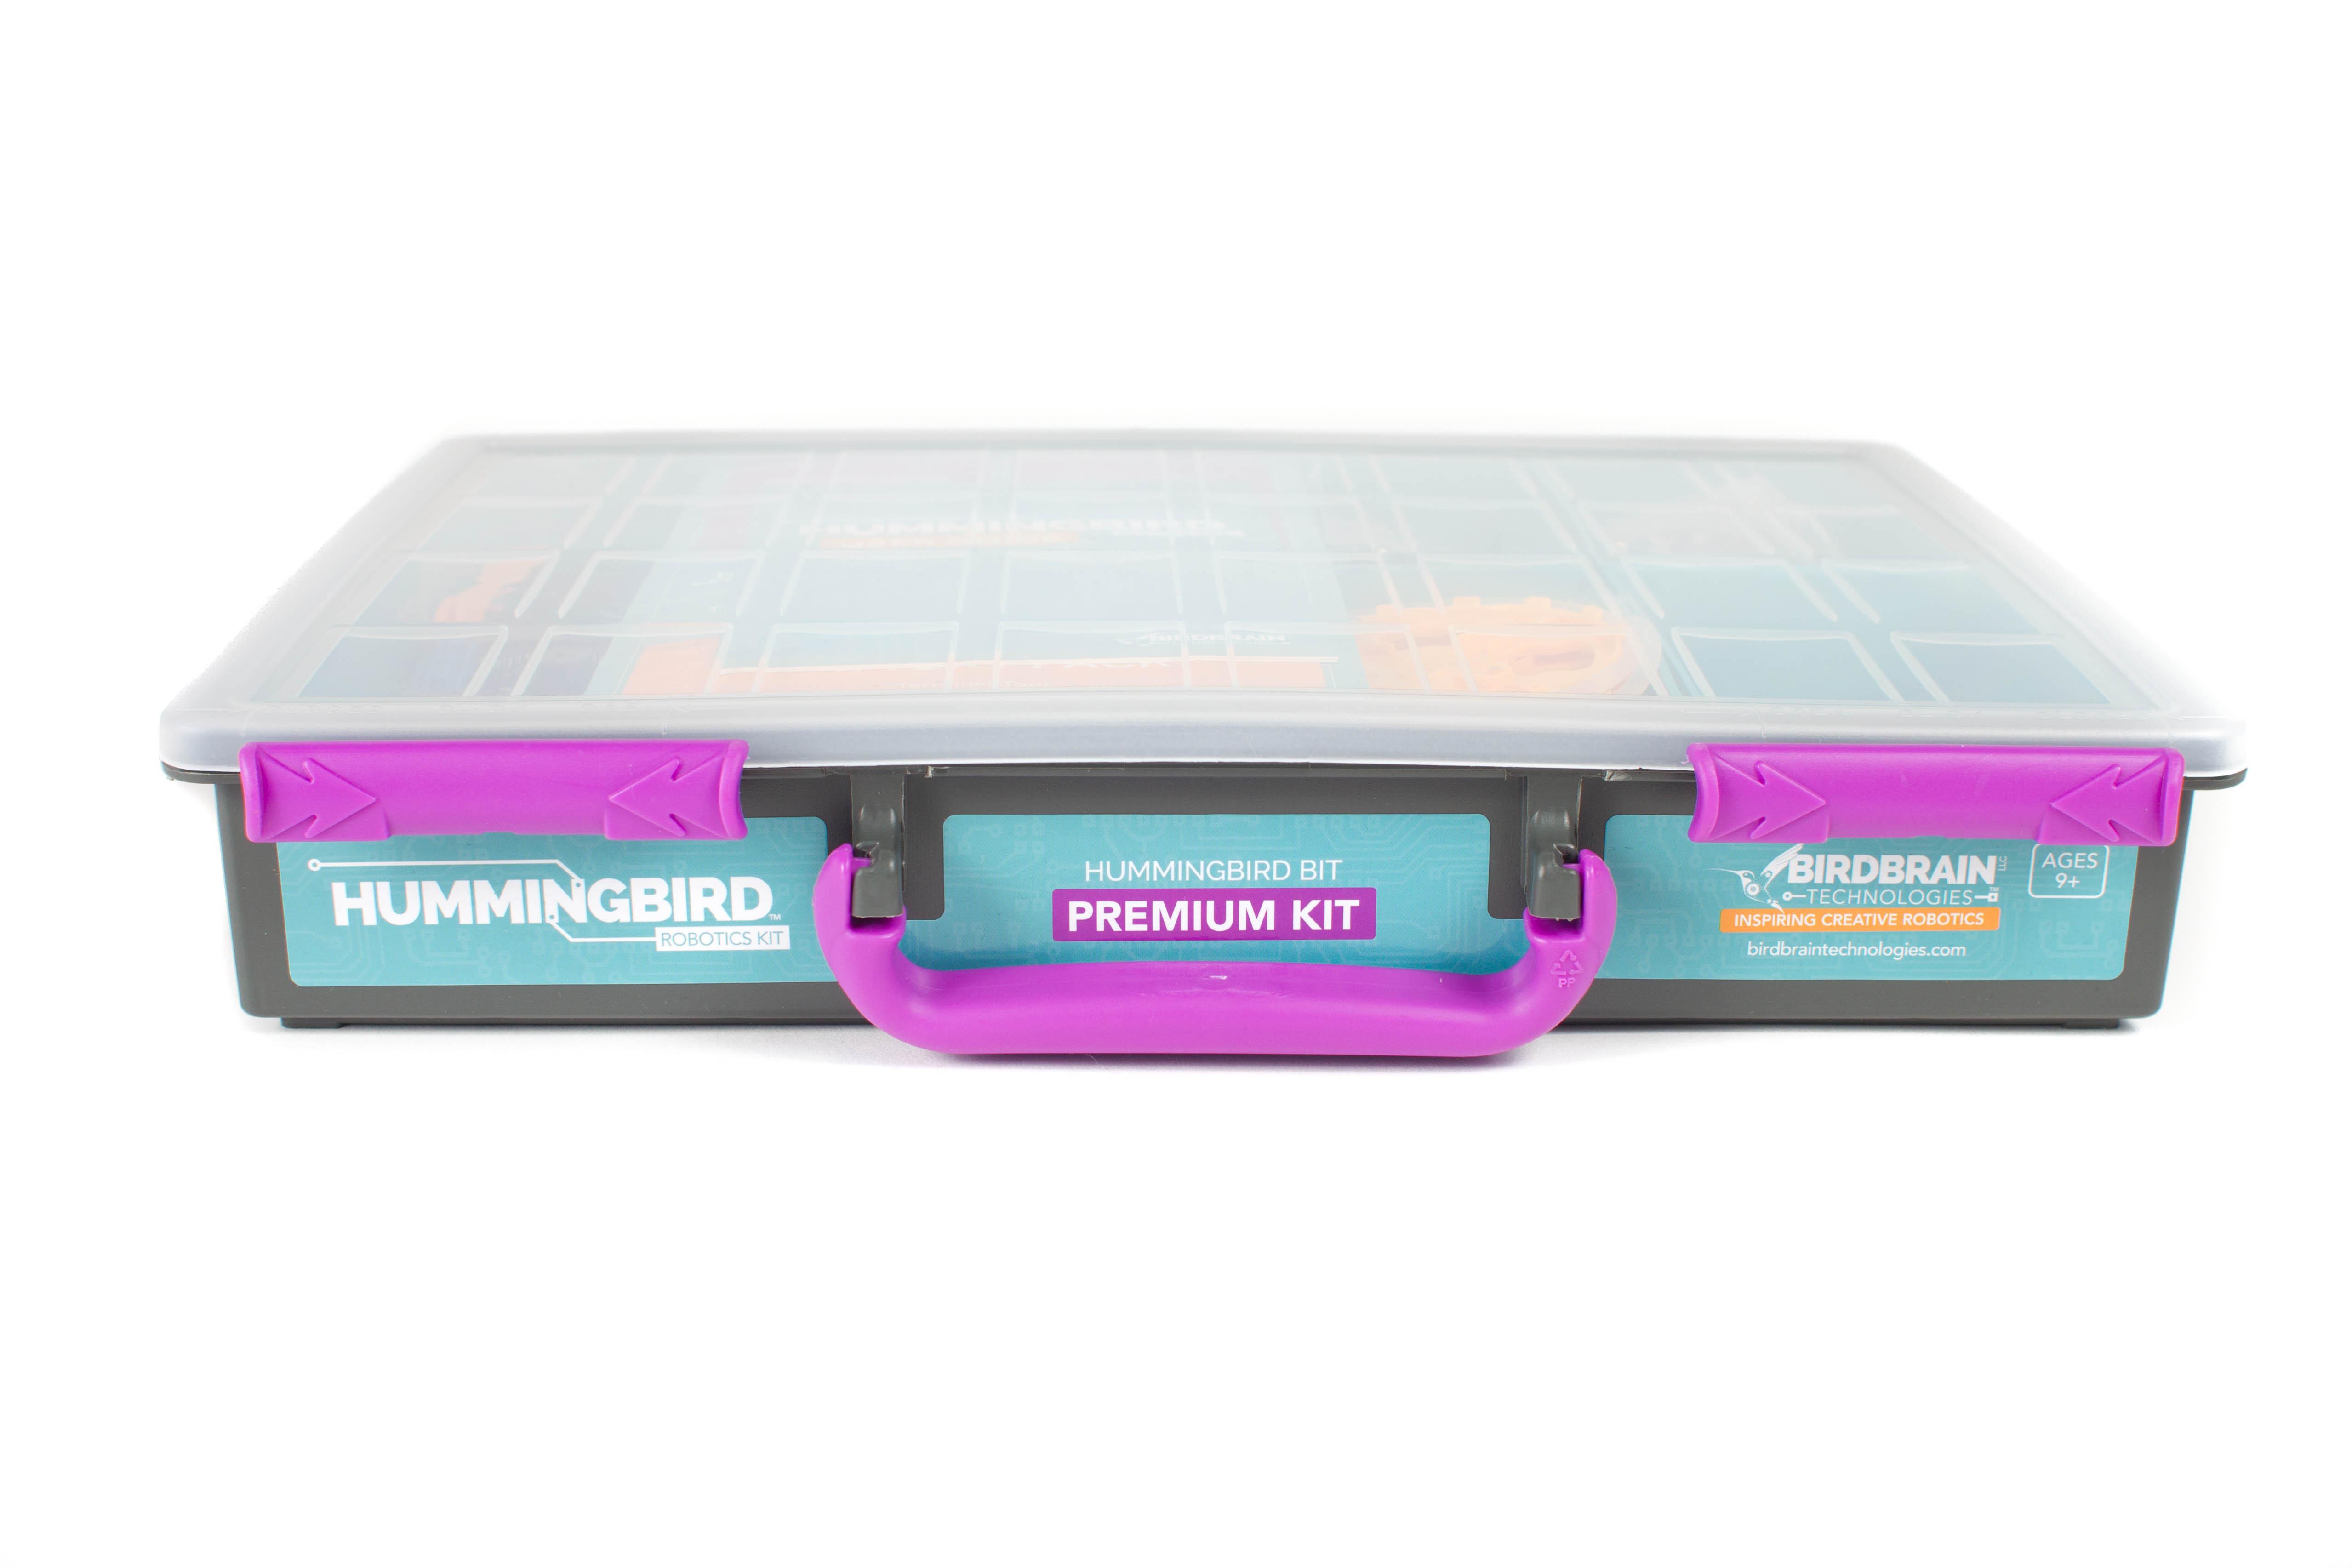 BirdBrain Technologies Hummingbird Premium Kit